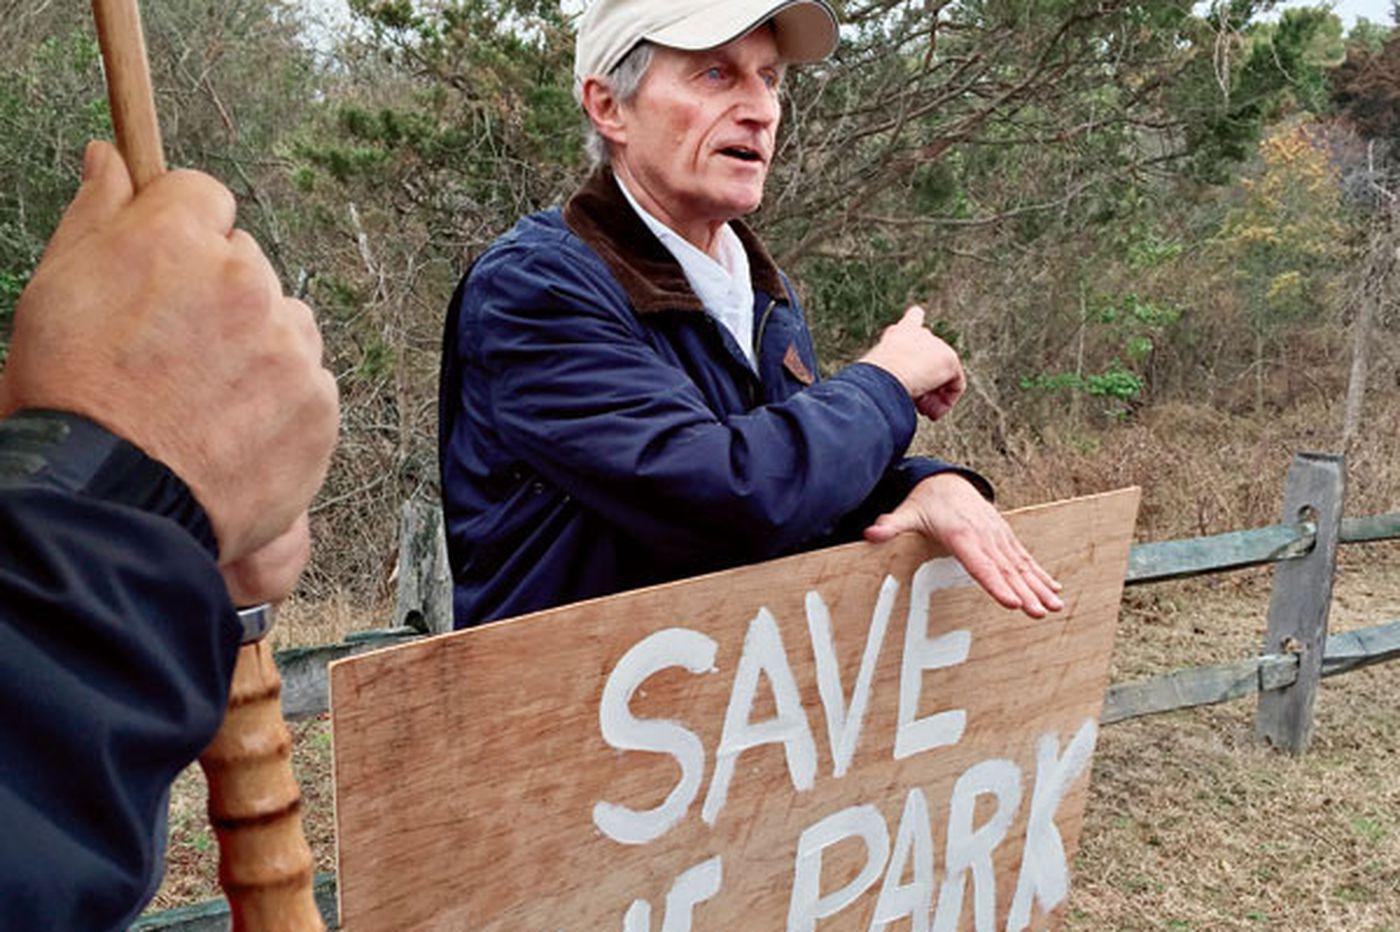 Avalon debates plan to save park beset by invasive species